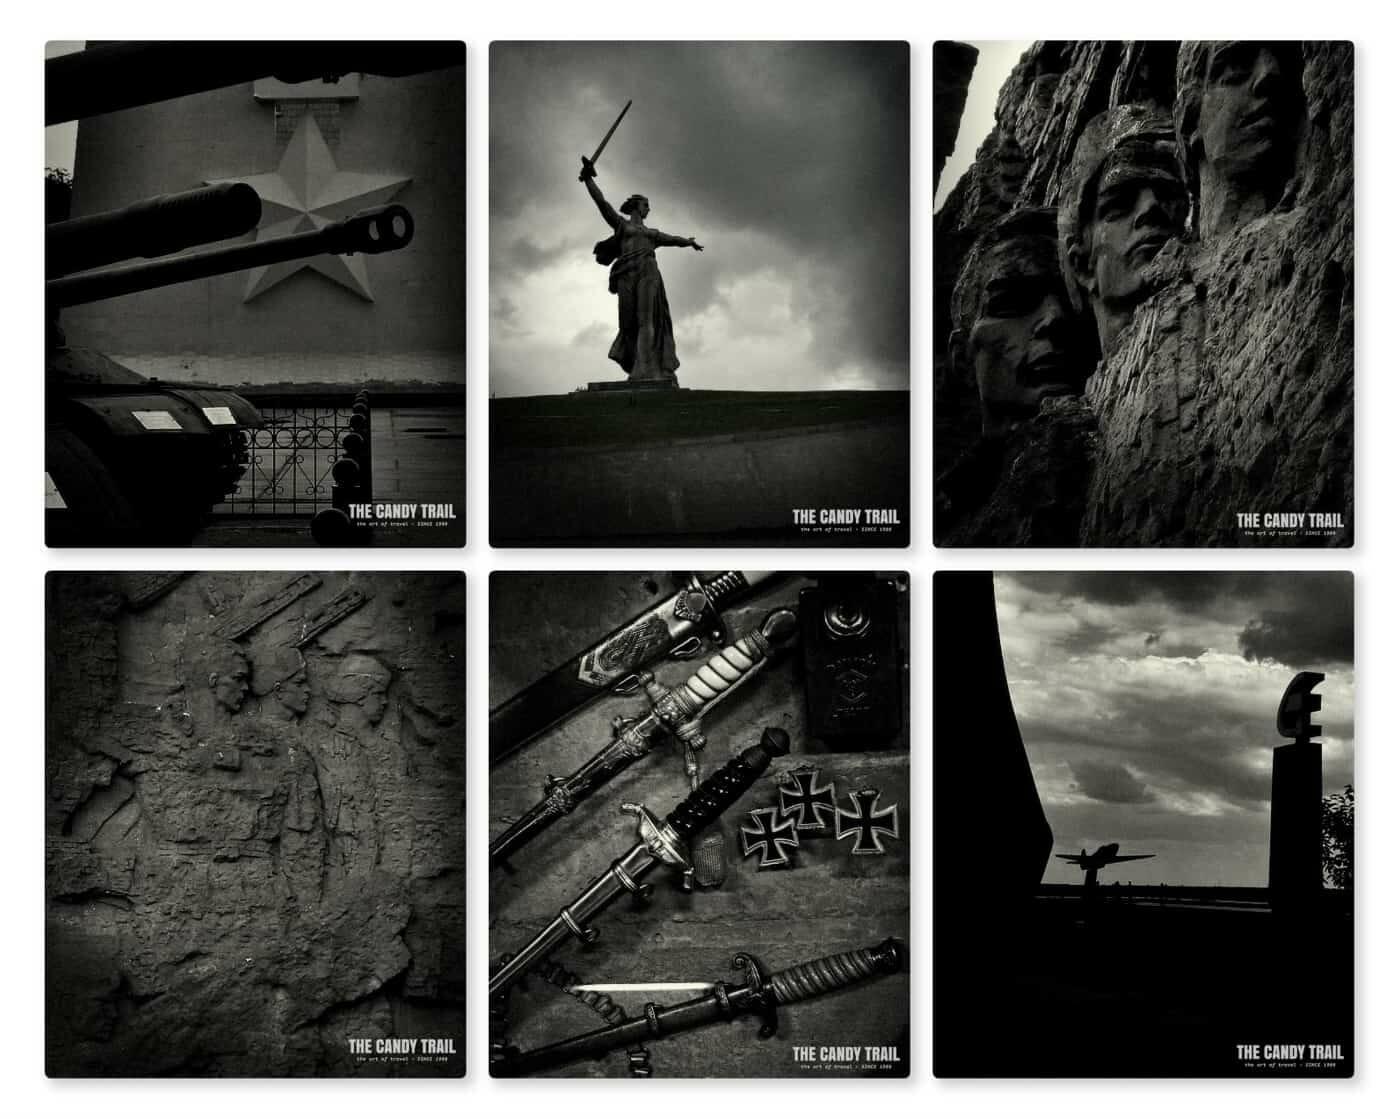 Various war memorials and reminders around Stalingrad battle site and museum